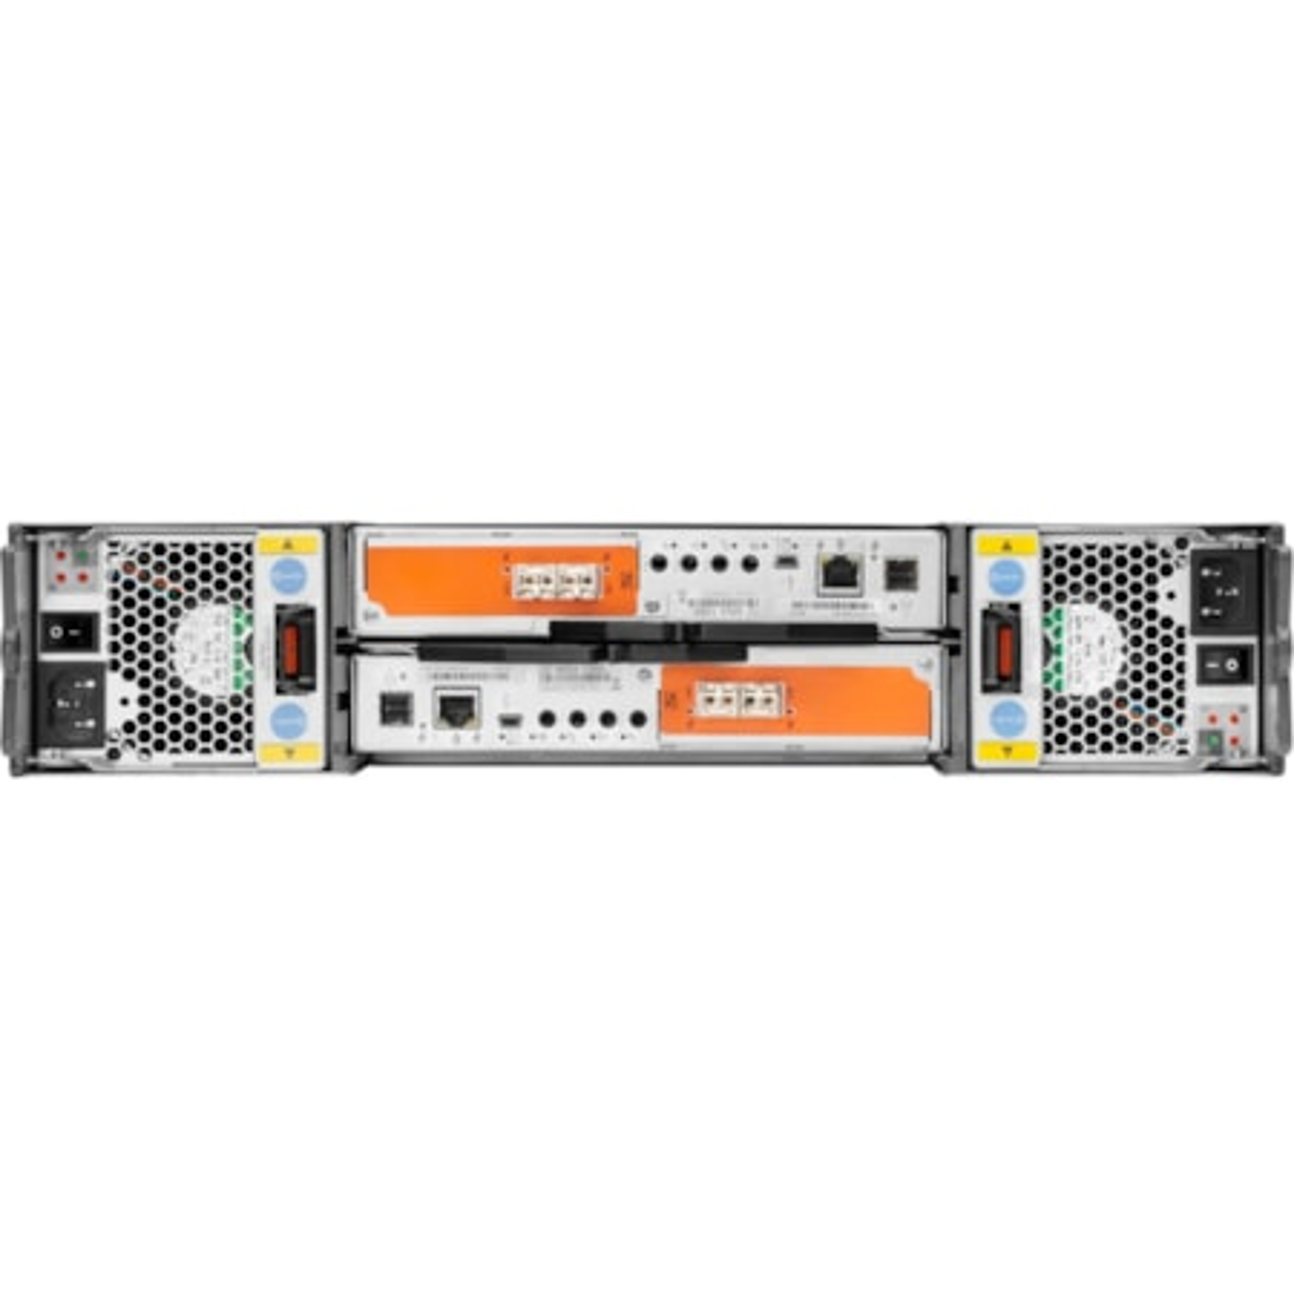 HPE 1060 24 x Total Bays SAN Storage System - 2U Rack-mountable